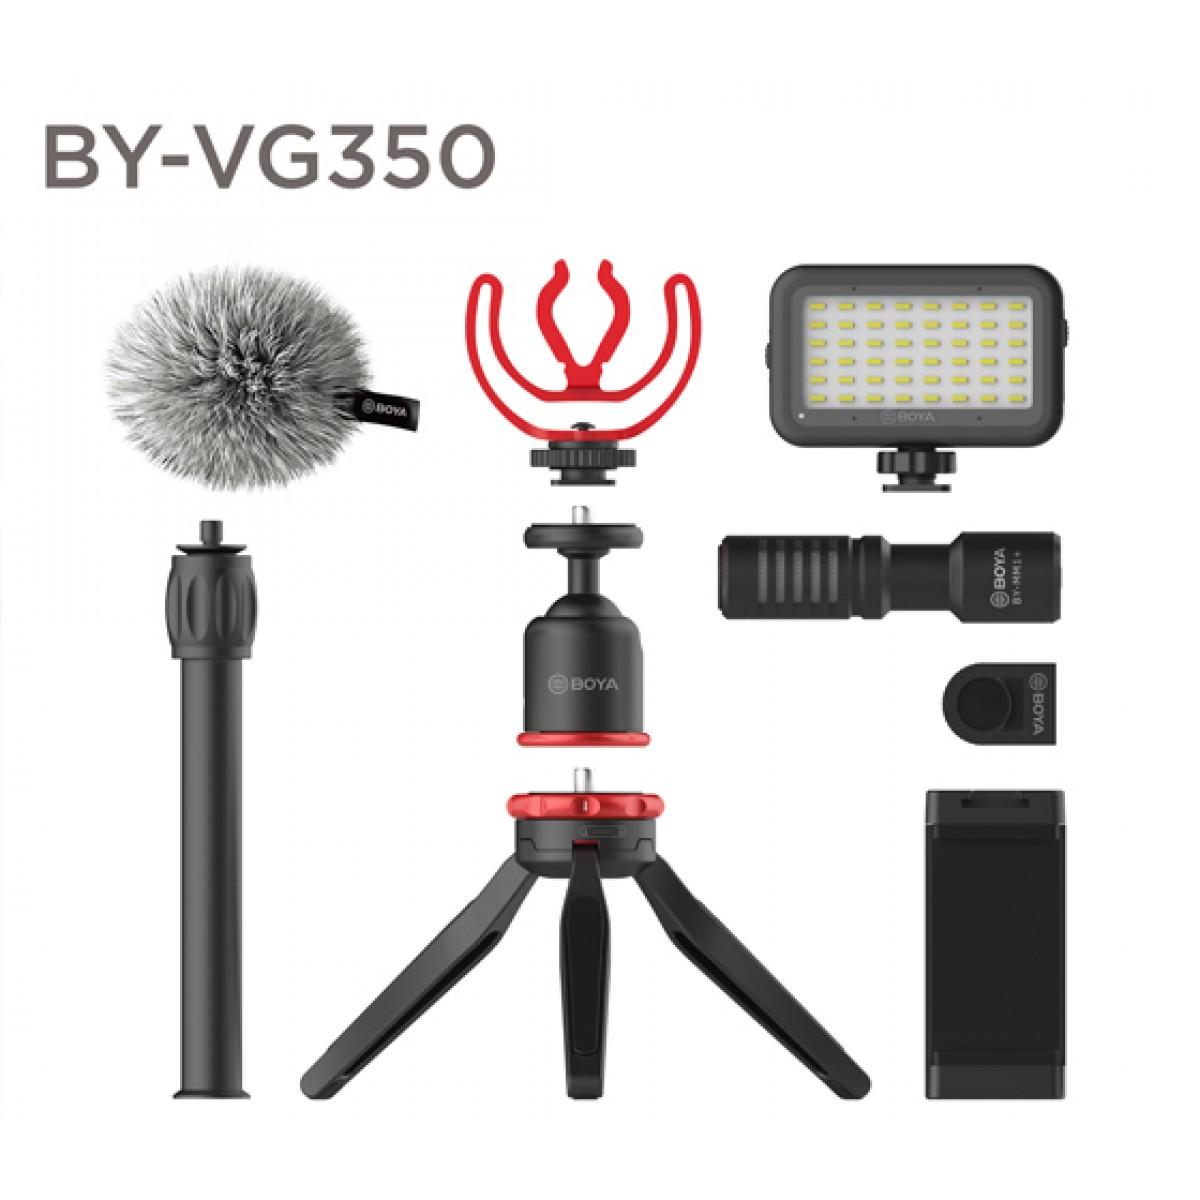 Microfone para Smartphone BOYA BY-VG350, Com Tripé, Com Luz, TRS/TRRS, Black